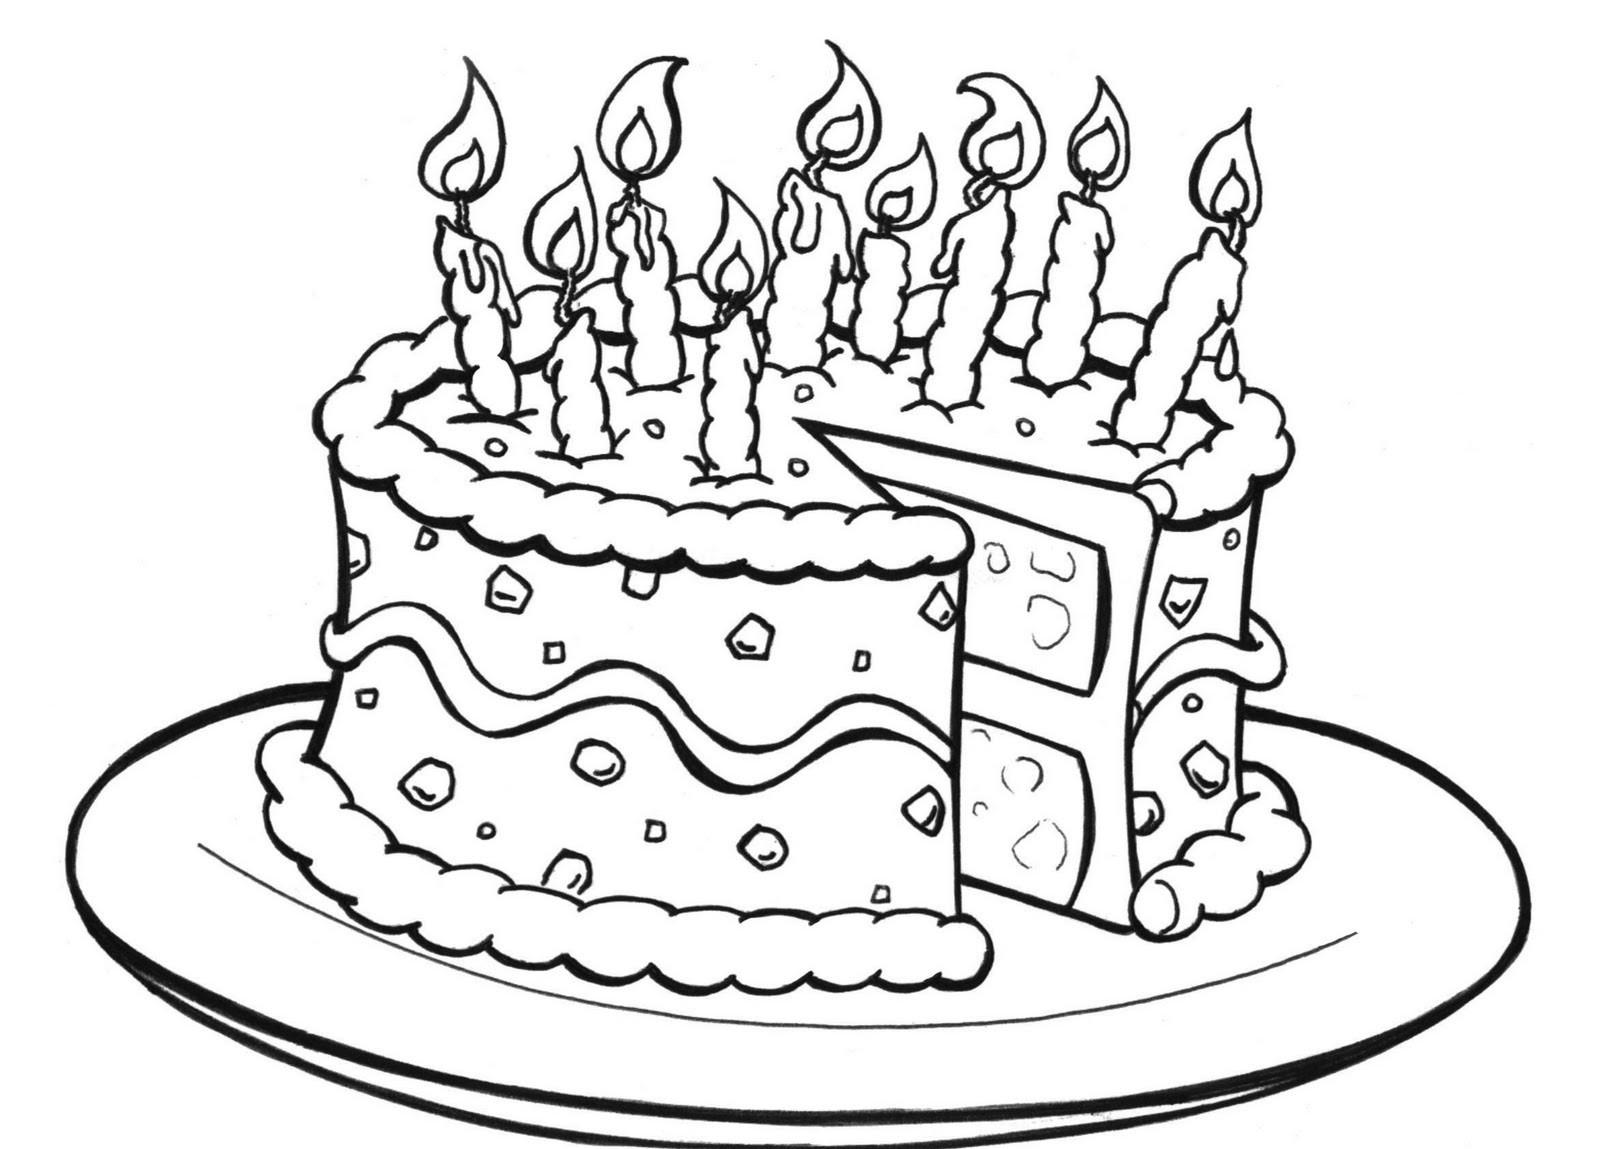 Shopkins birthday cake clipart jpg black and white stock Shopkins birthday cake clipart - ClipartFest jpg black and white stock